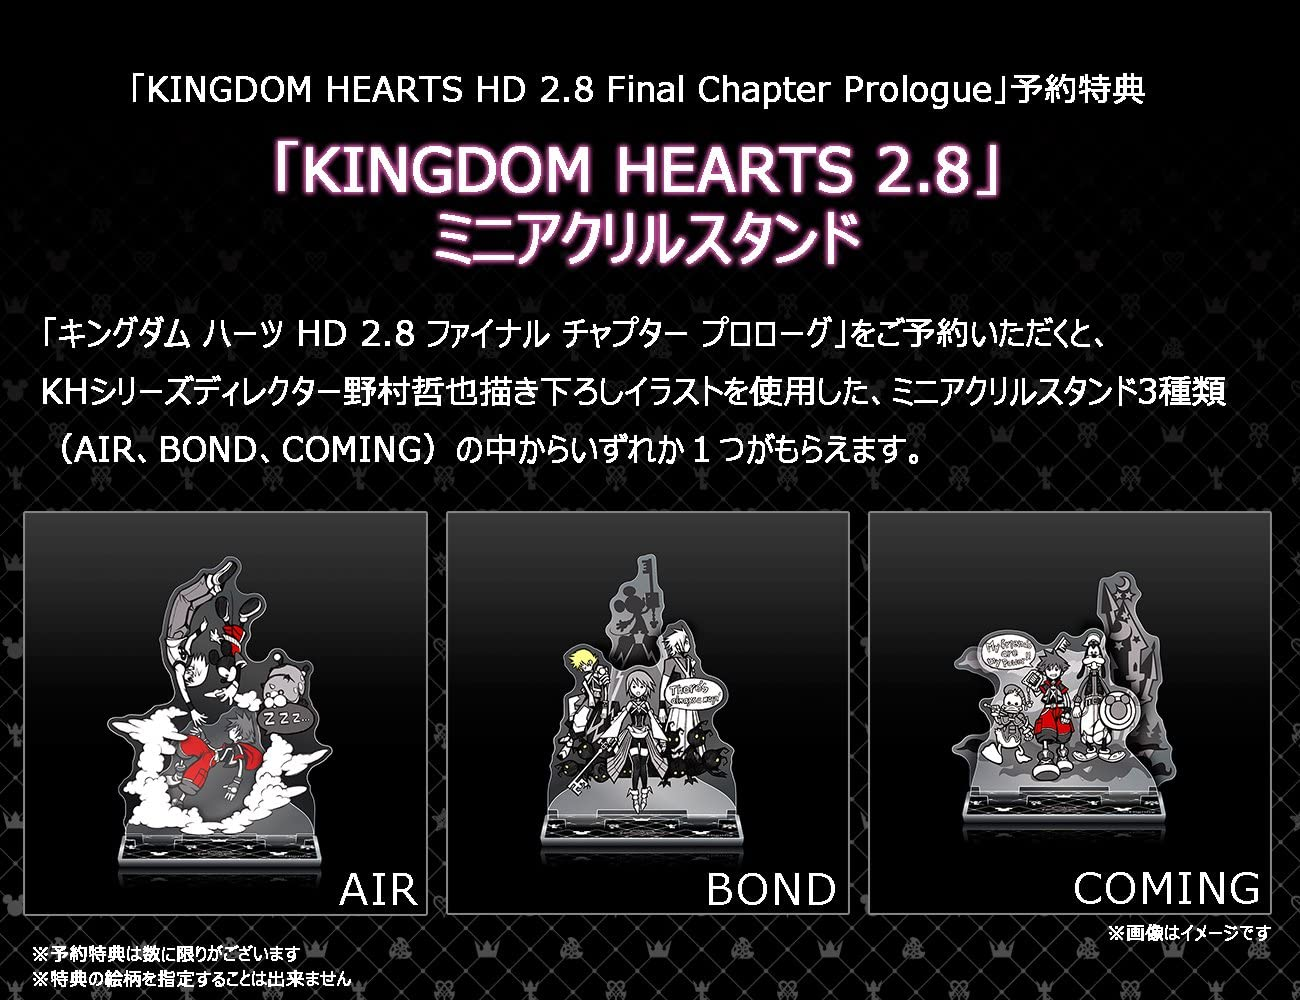 Kingdom Hearts HD 2.8 Final chapter prologue acrylic stand BOND Japan